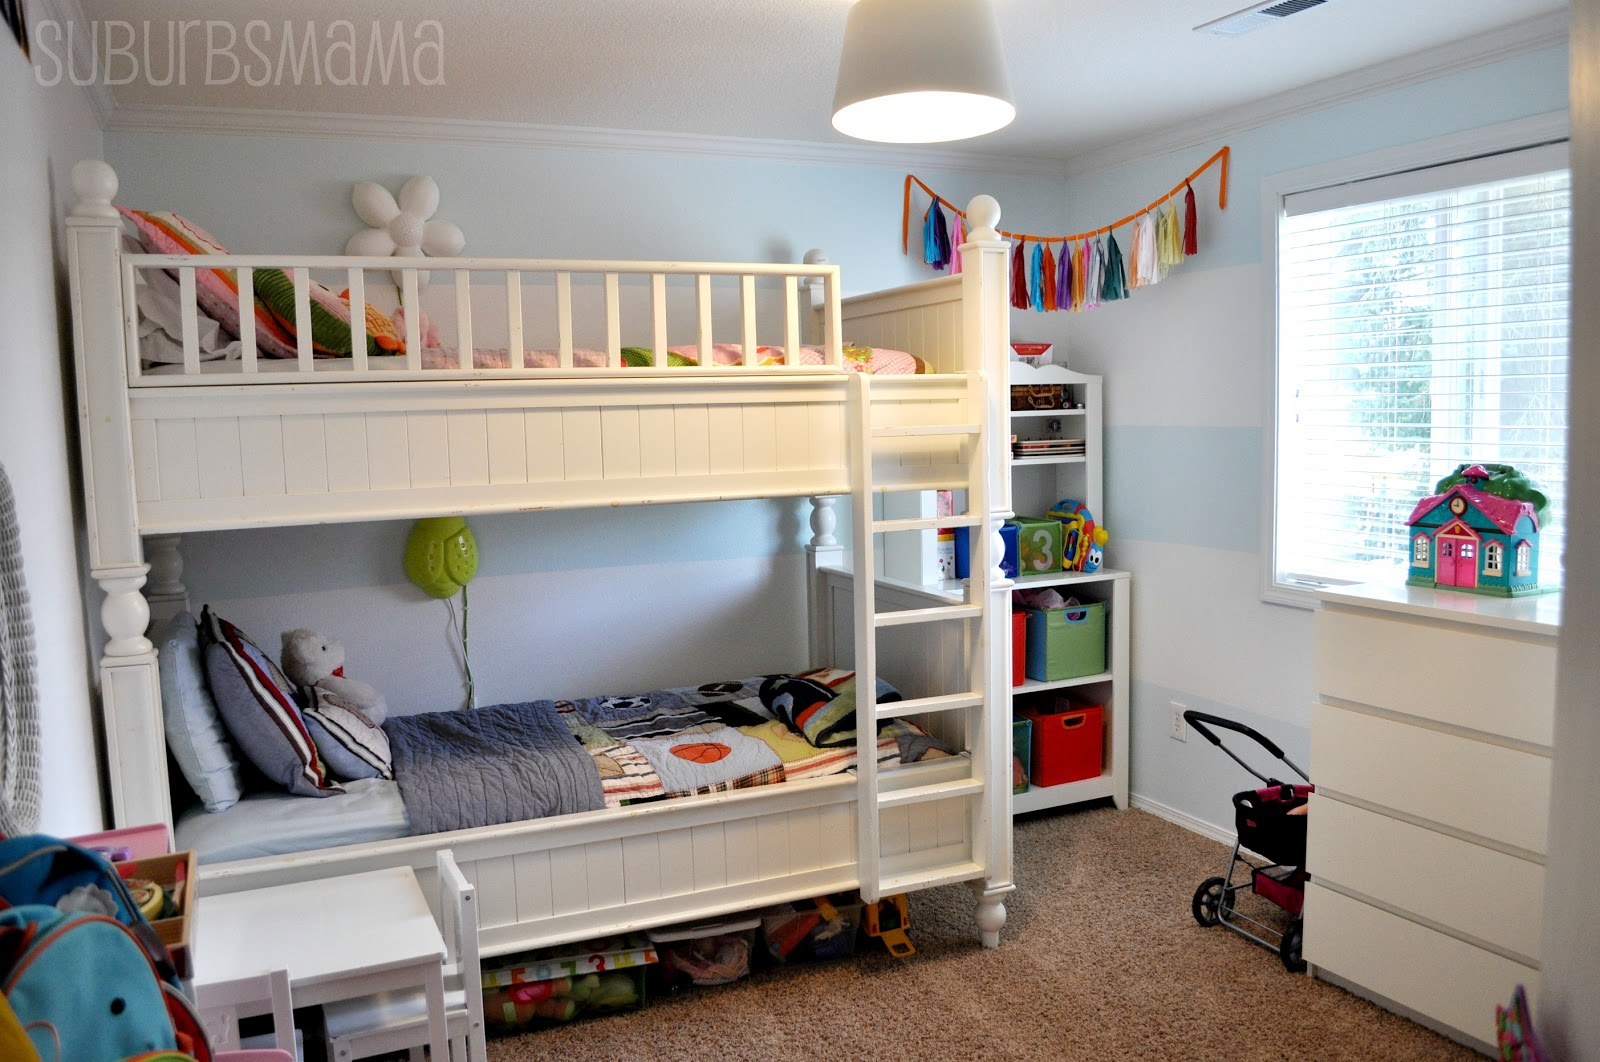 Shared Boys Geometrical Bedroom: Suburbs Mama: New Shared Kids Room Tour